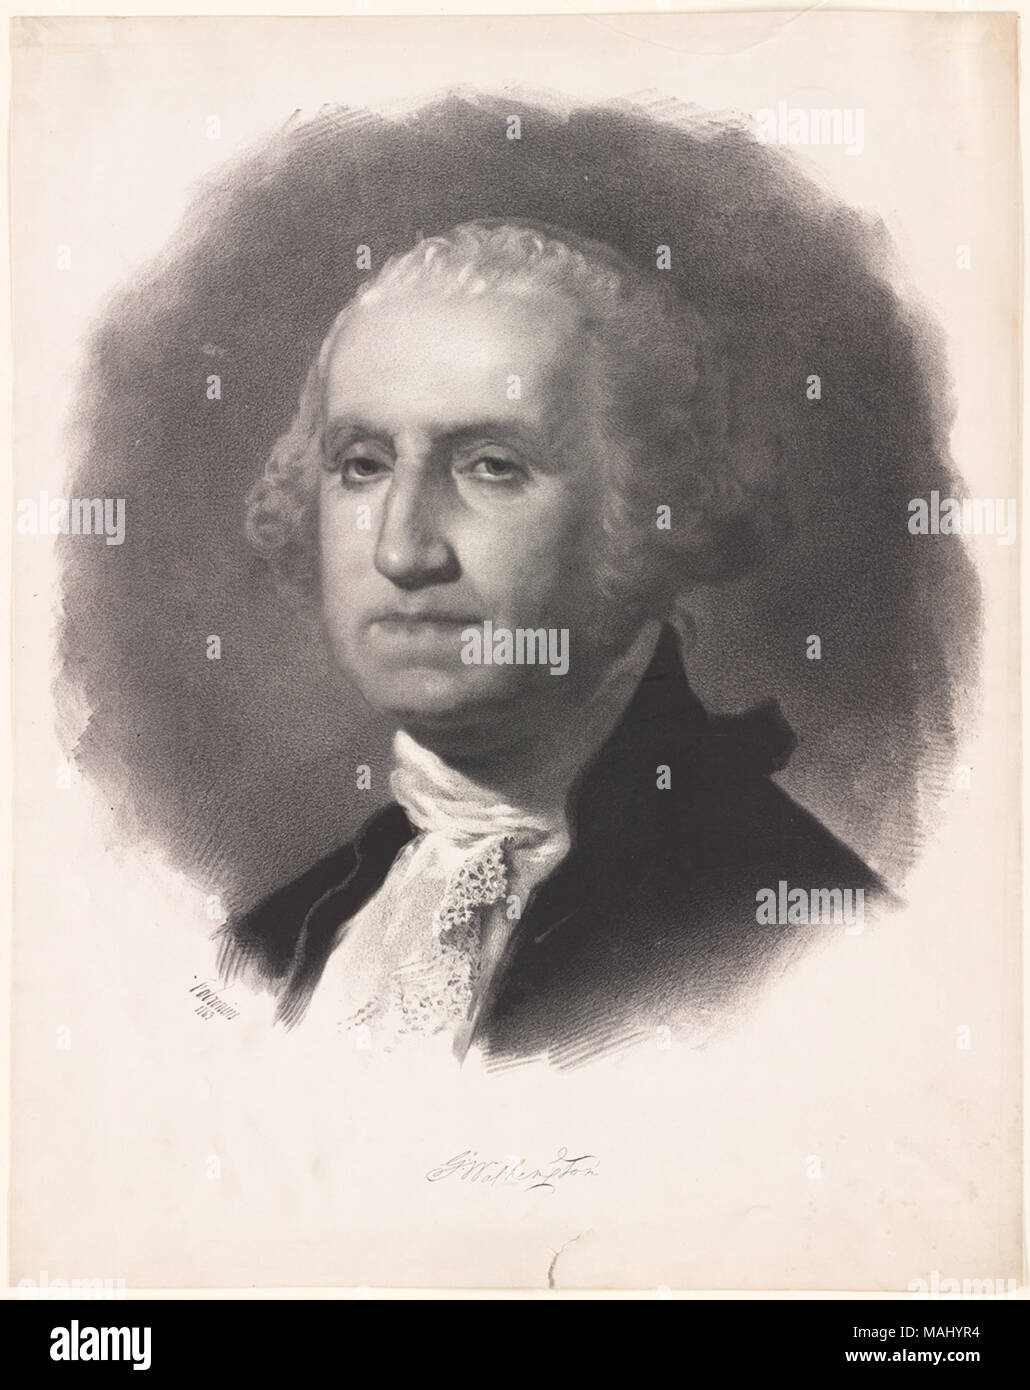 Hermosa Dibujos Para Colorear De George Washington Inspiración ...